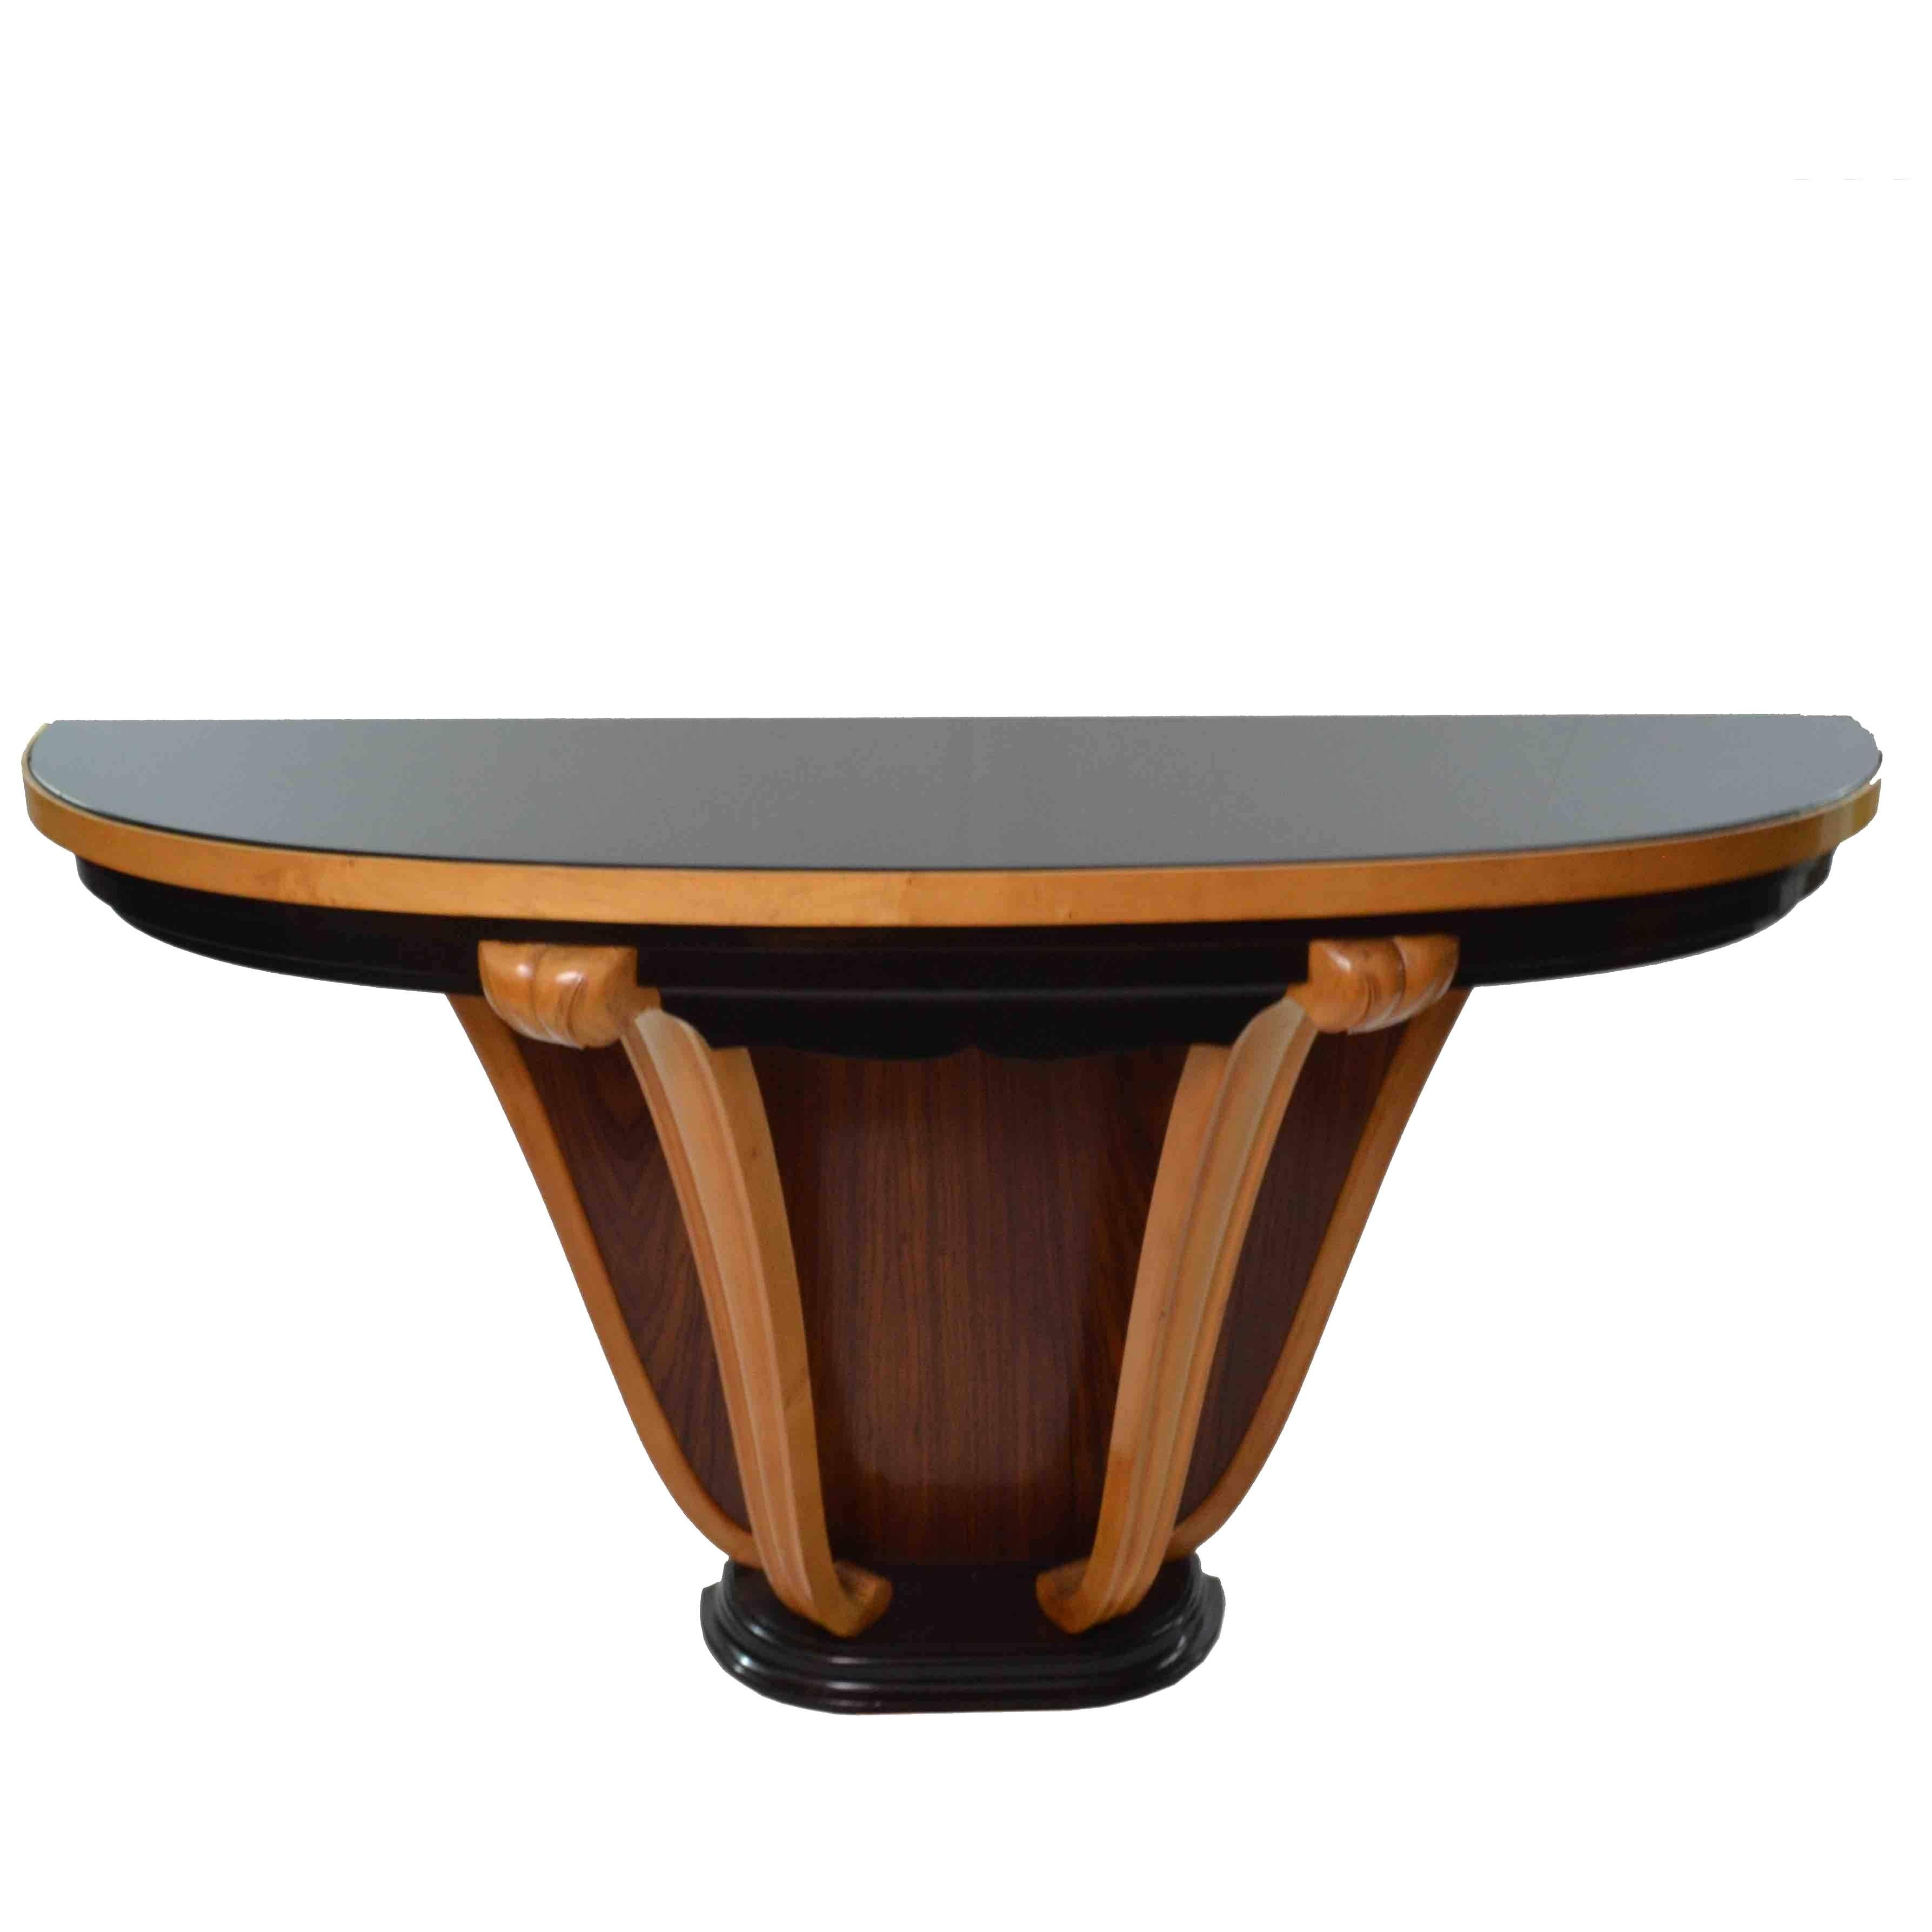 20th century art deco italian half moon table console 1